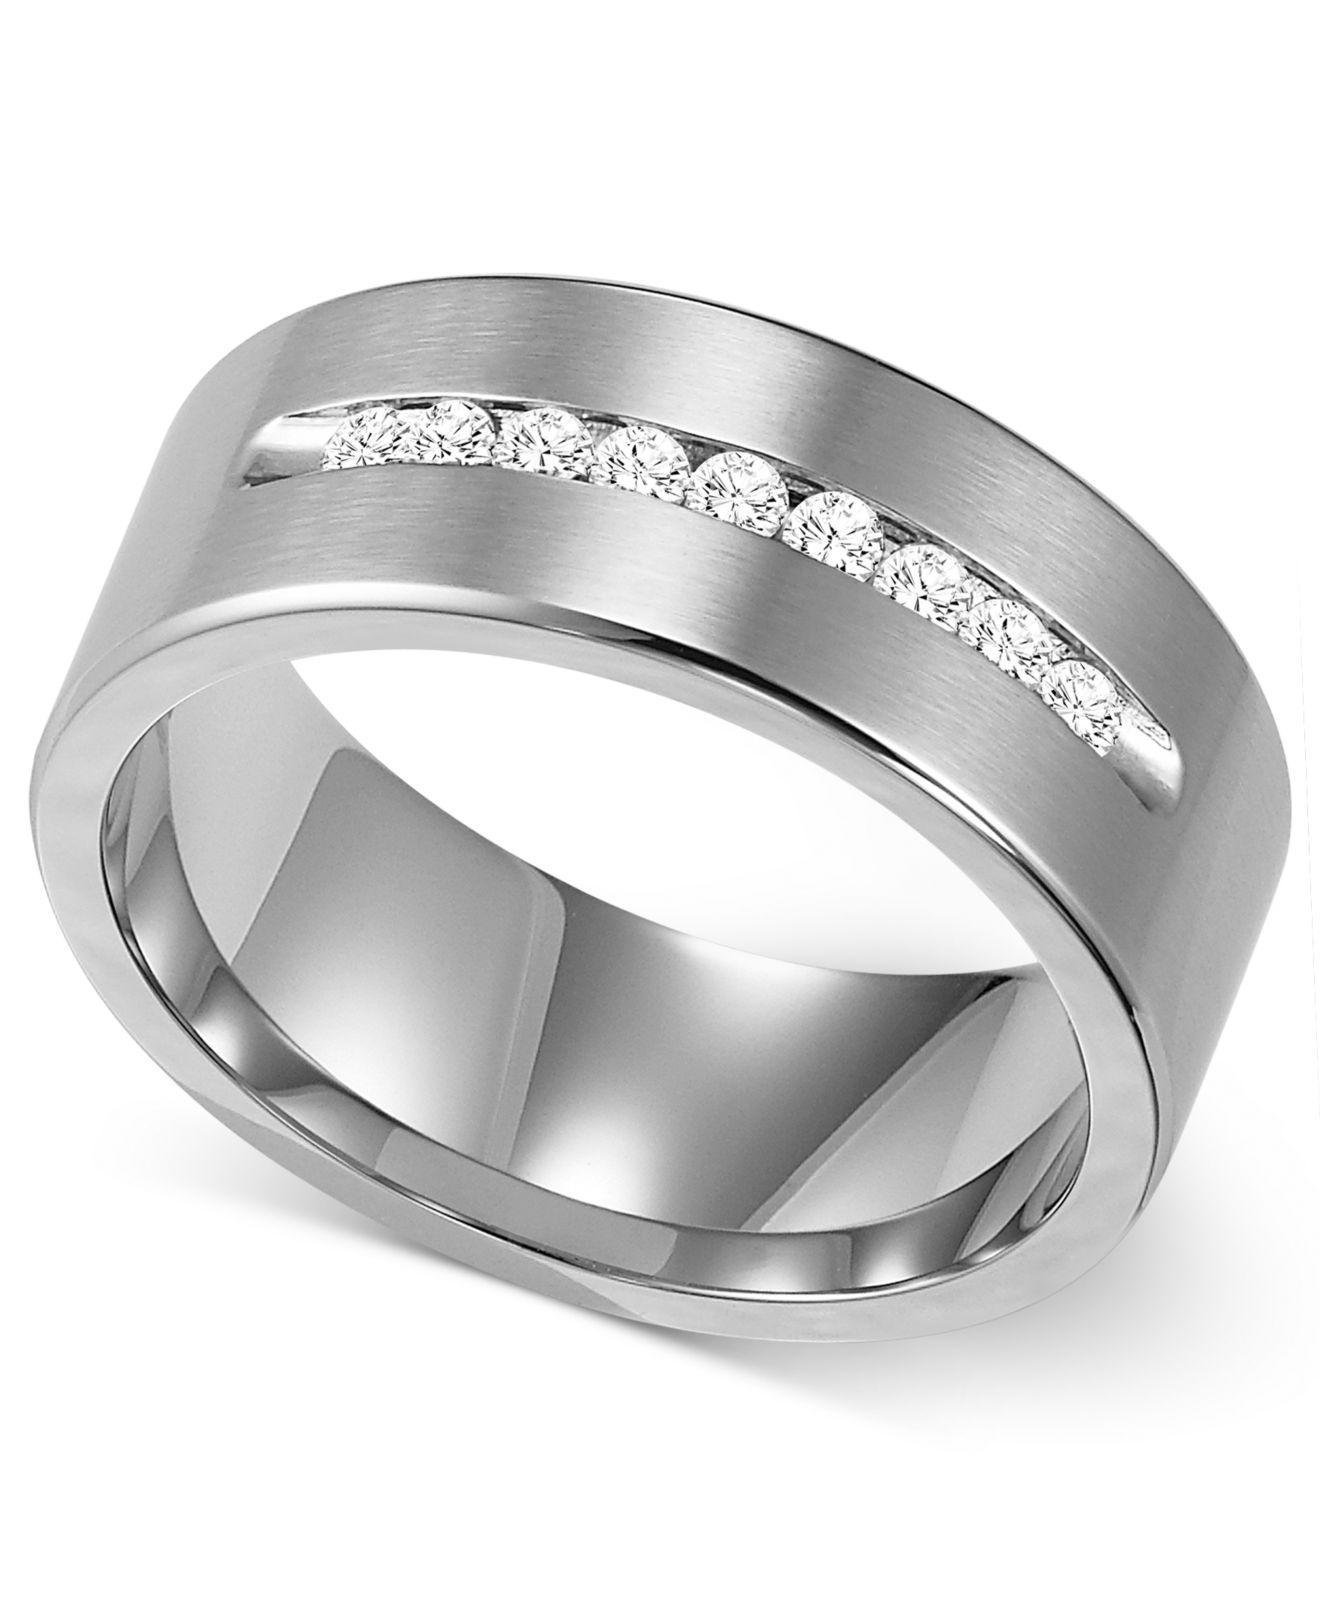 b66796c2509613 Lyst - Triton Men's Channel-set Diamond Wedding Band In Cobalt (1/4 ...